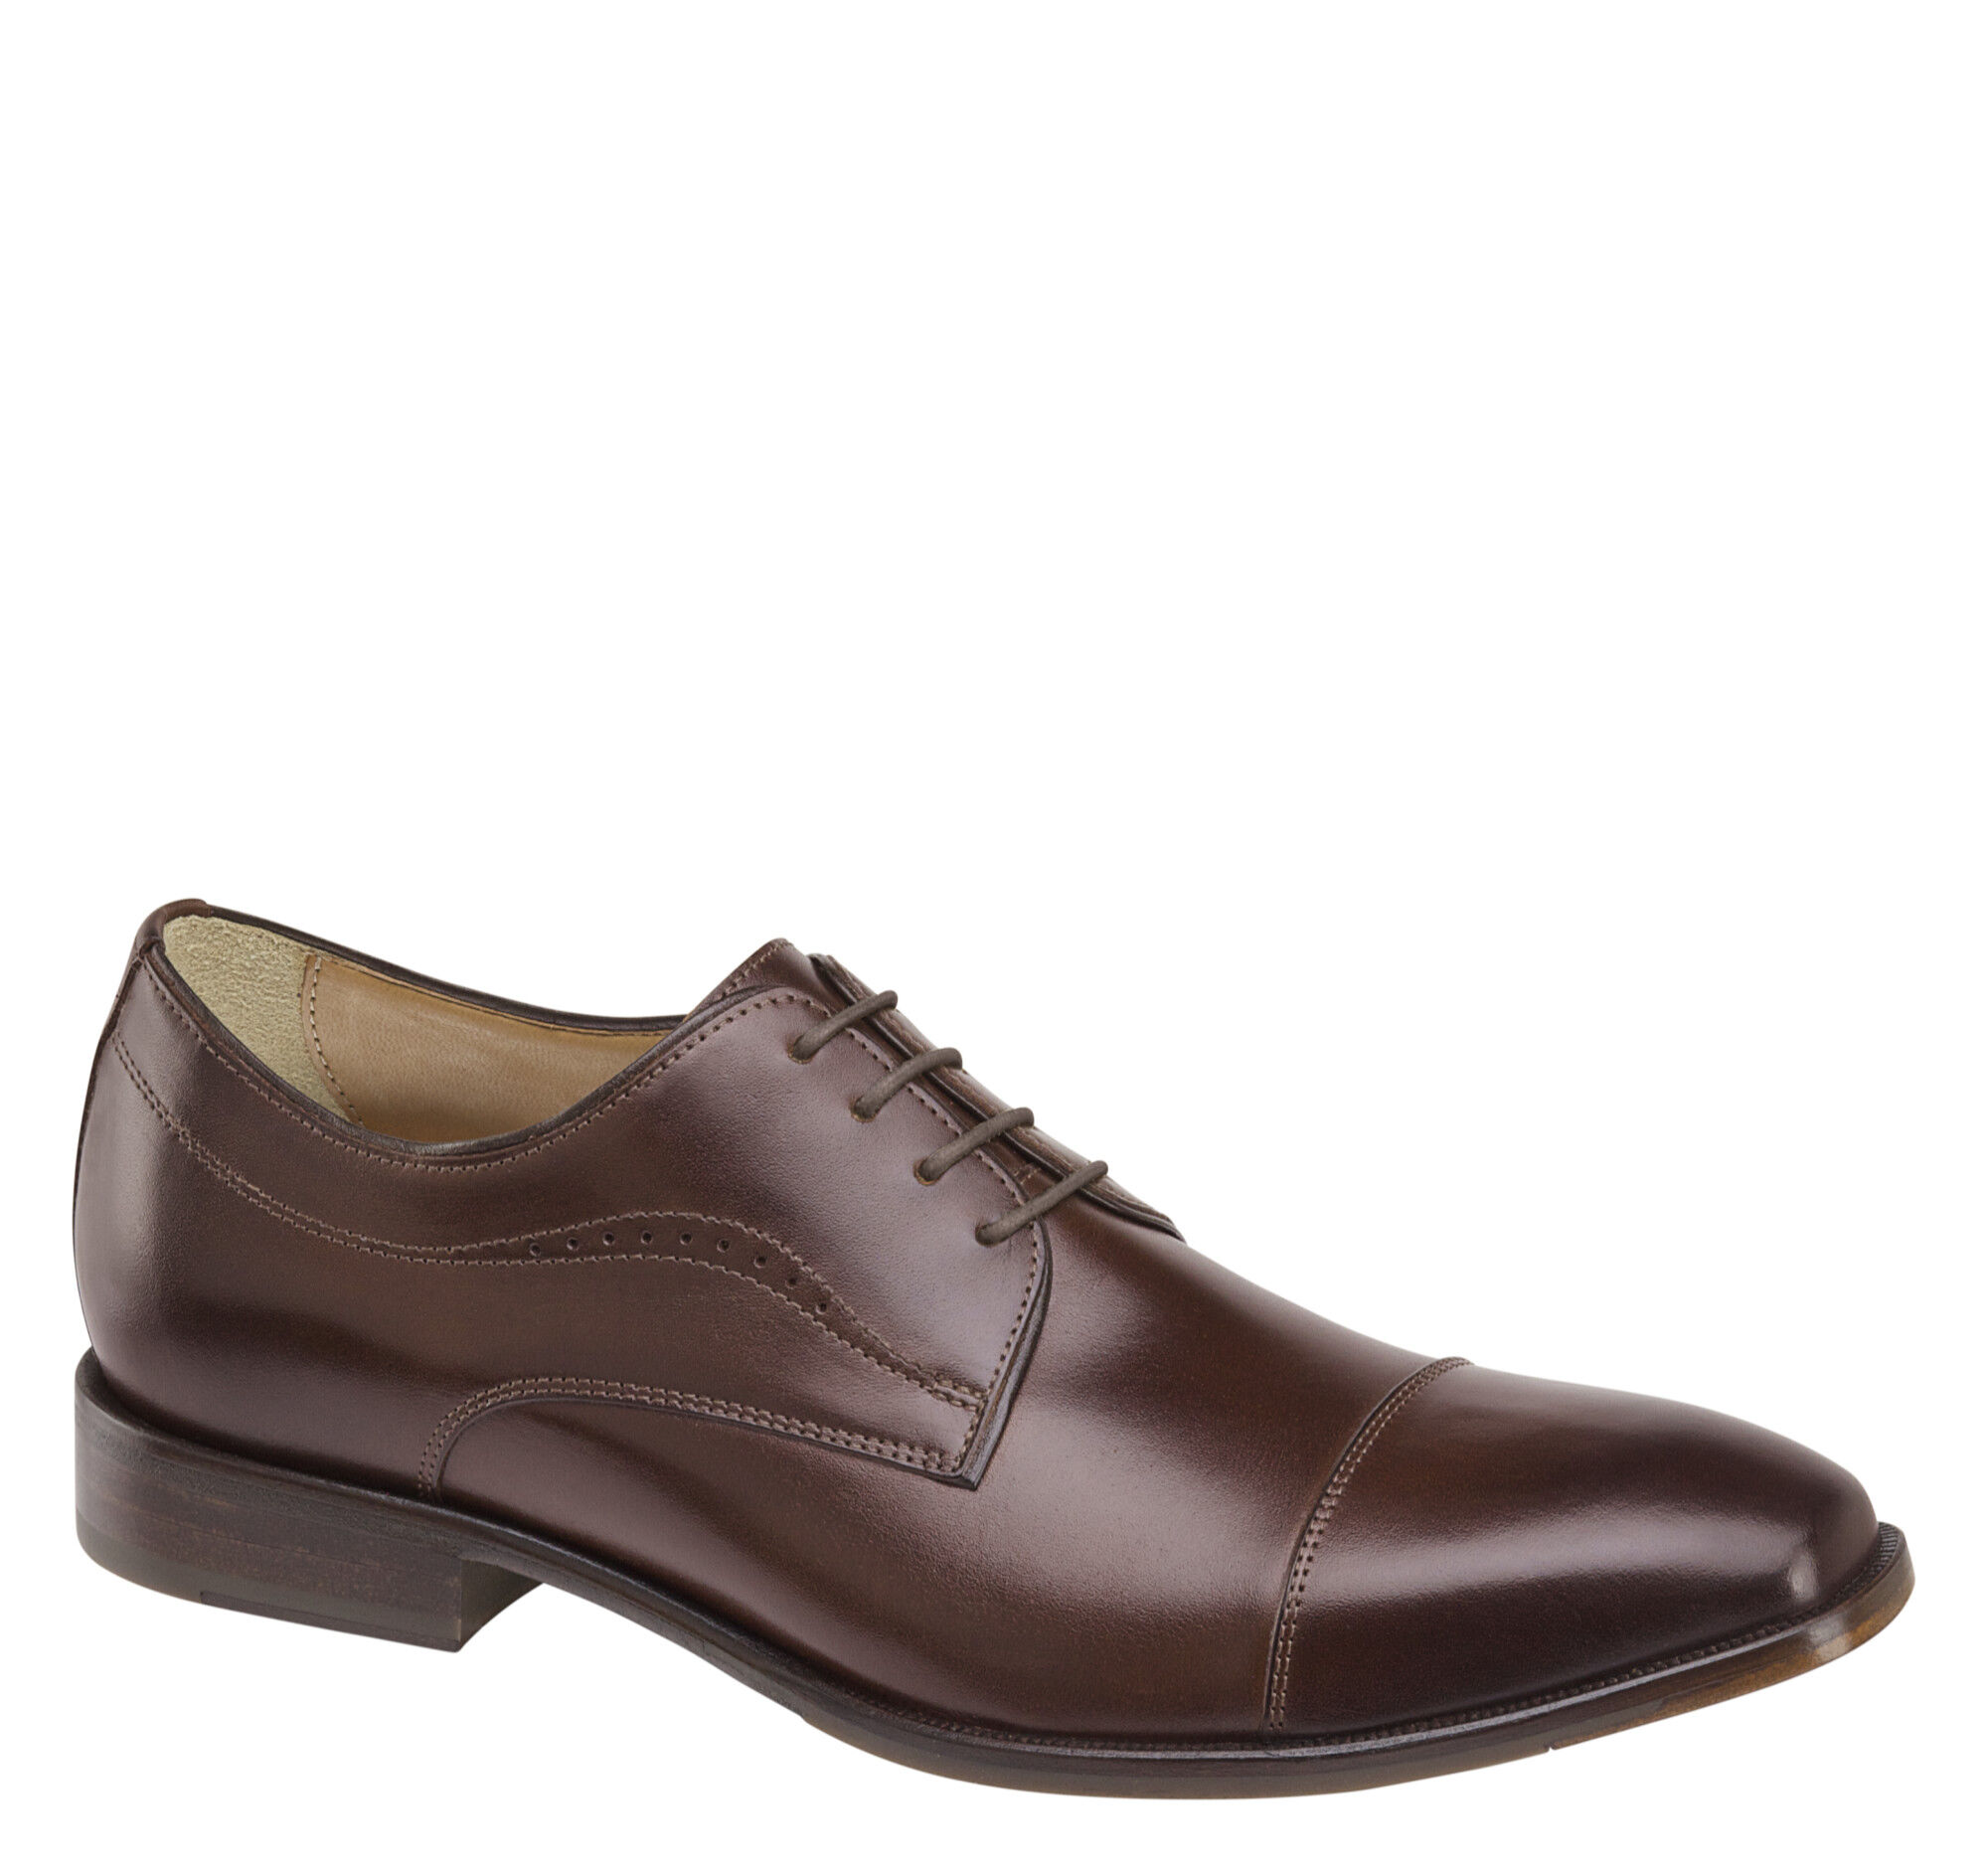 Johnston & Murphy Men's McClain Cap-Toe Oxfords Men's Shoes kRq6bh